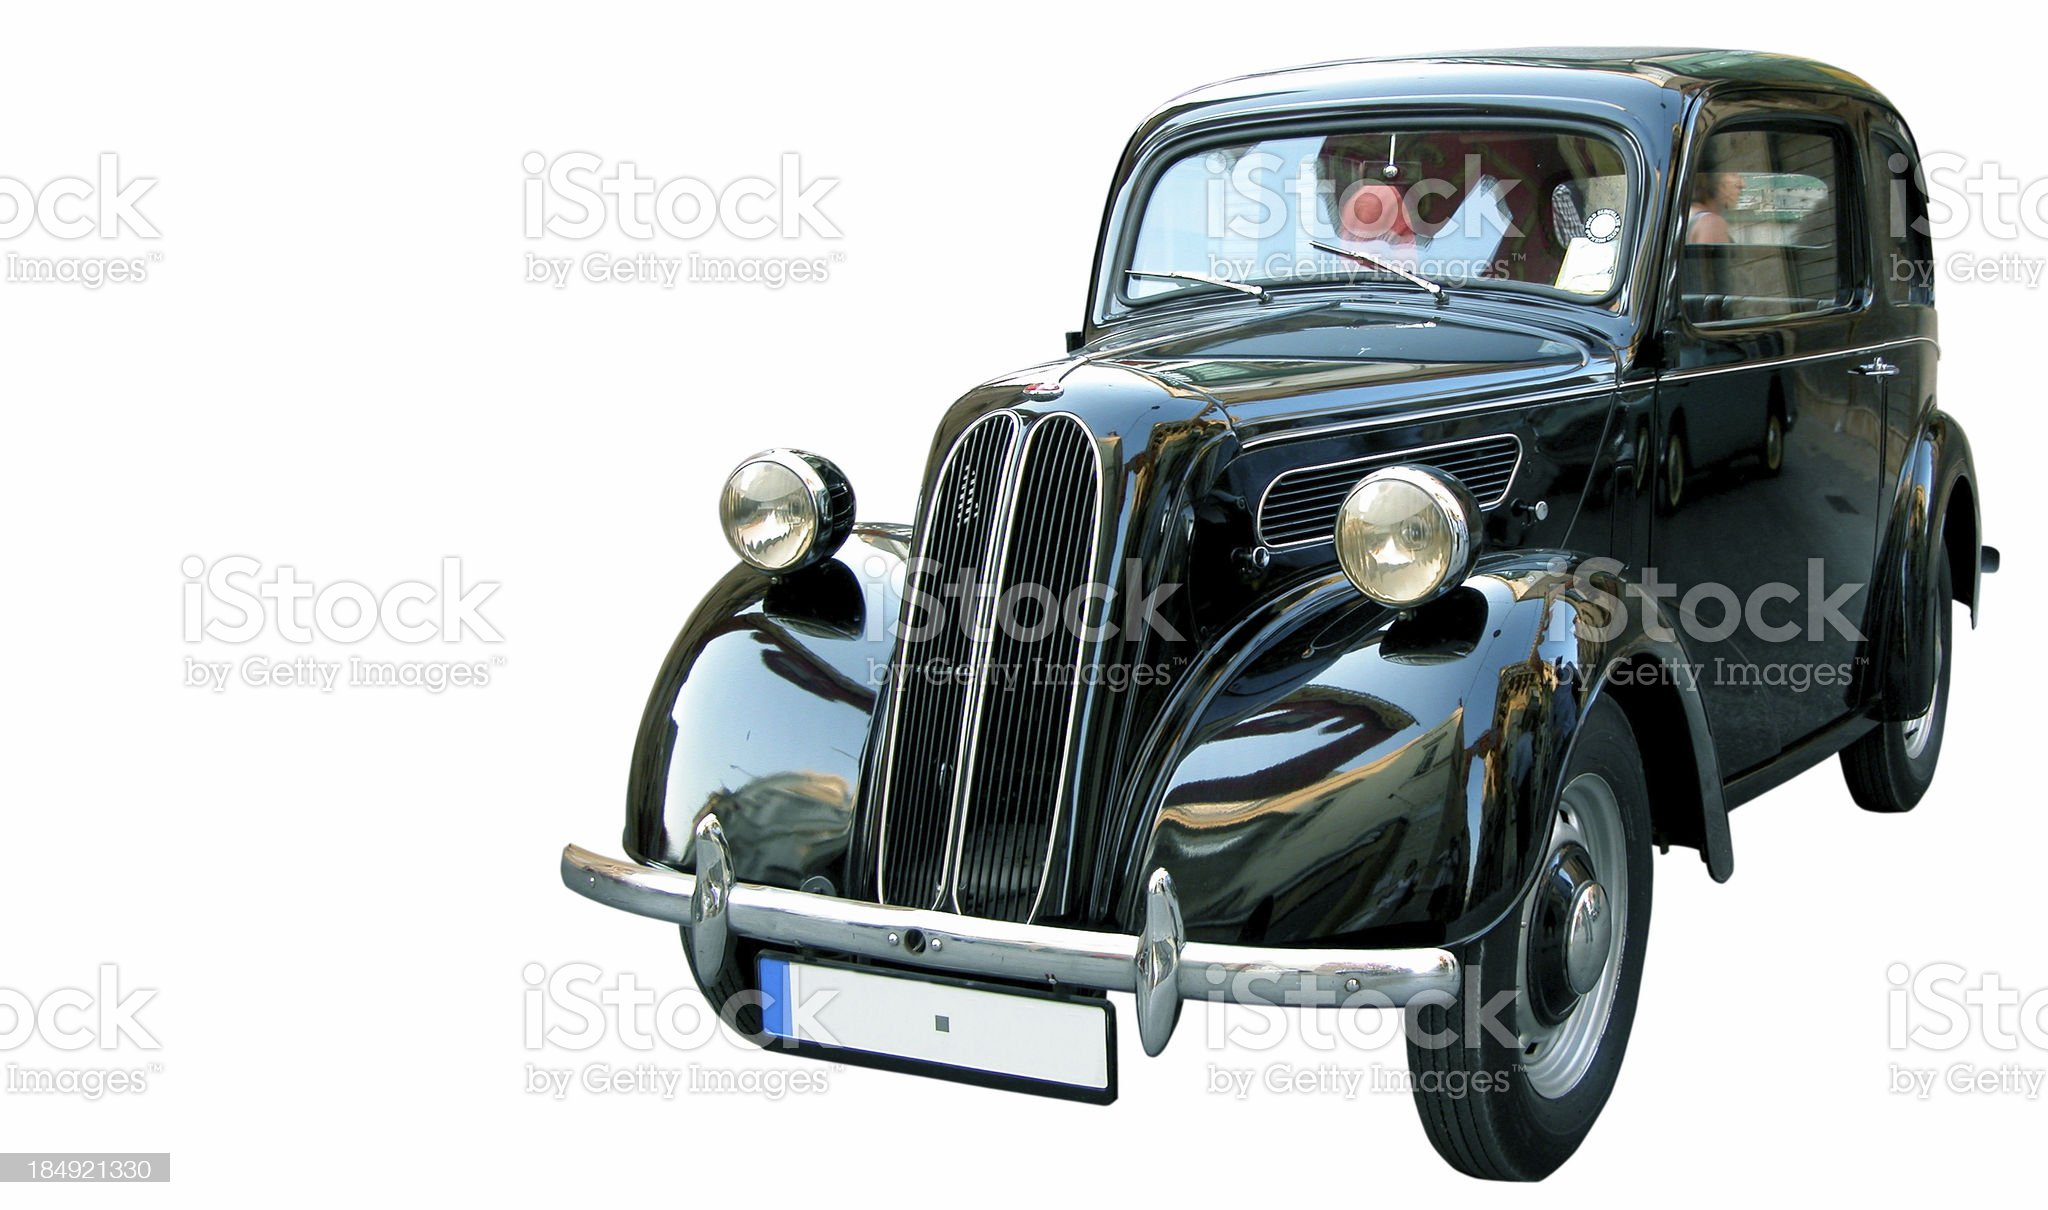 Vintage 1949 Car royalty-free stock photo